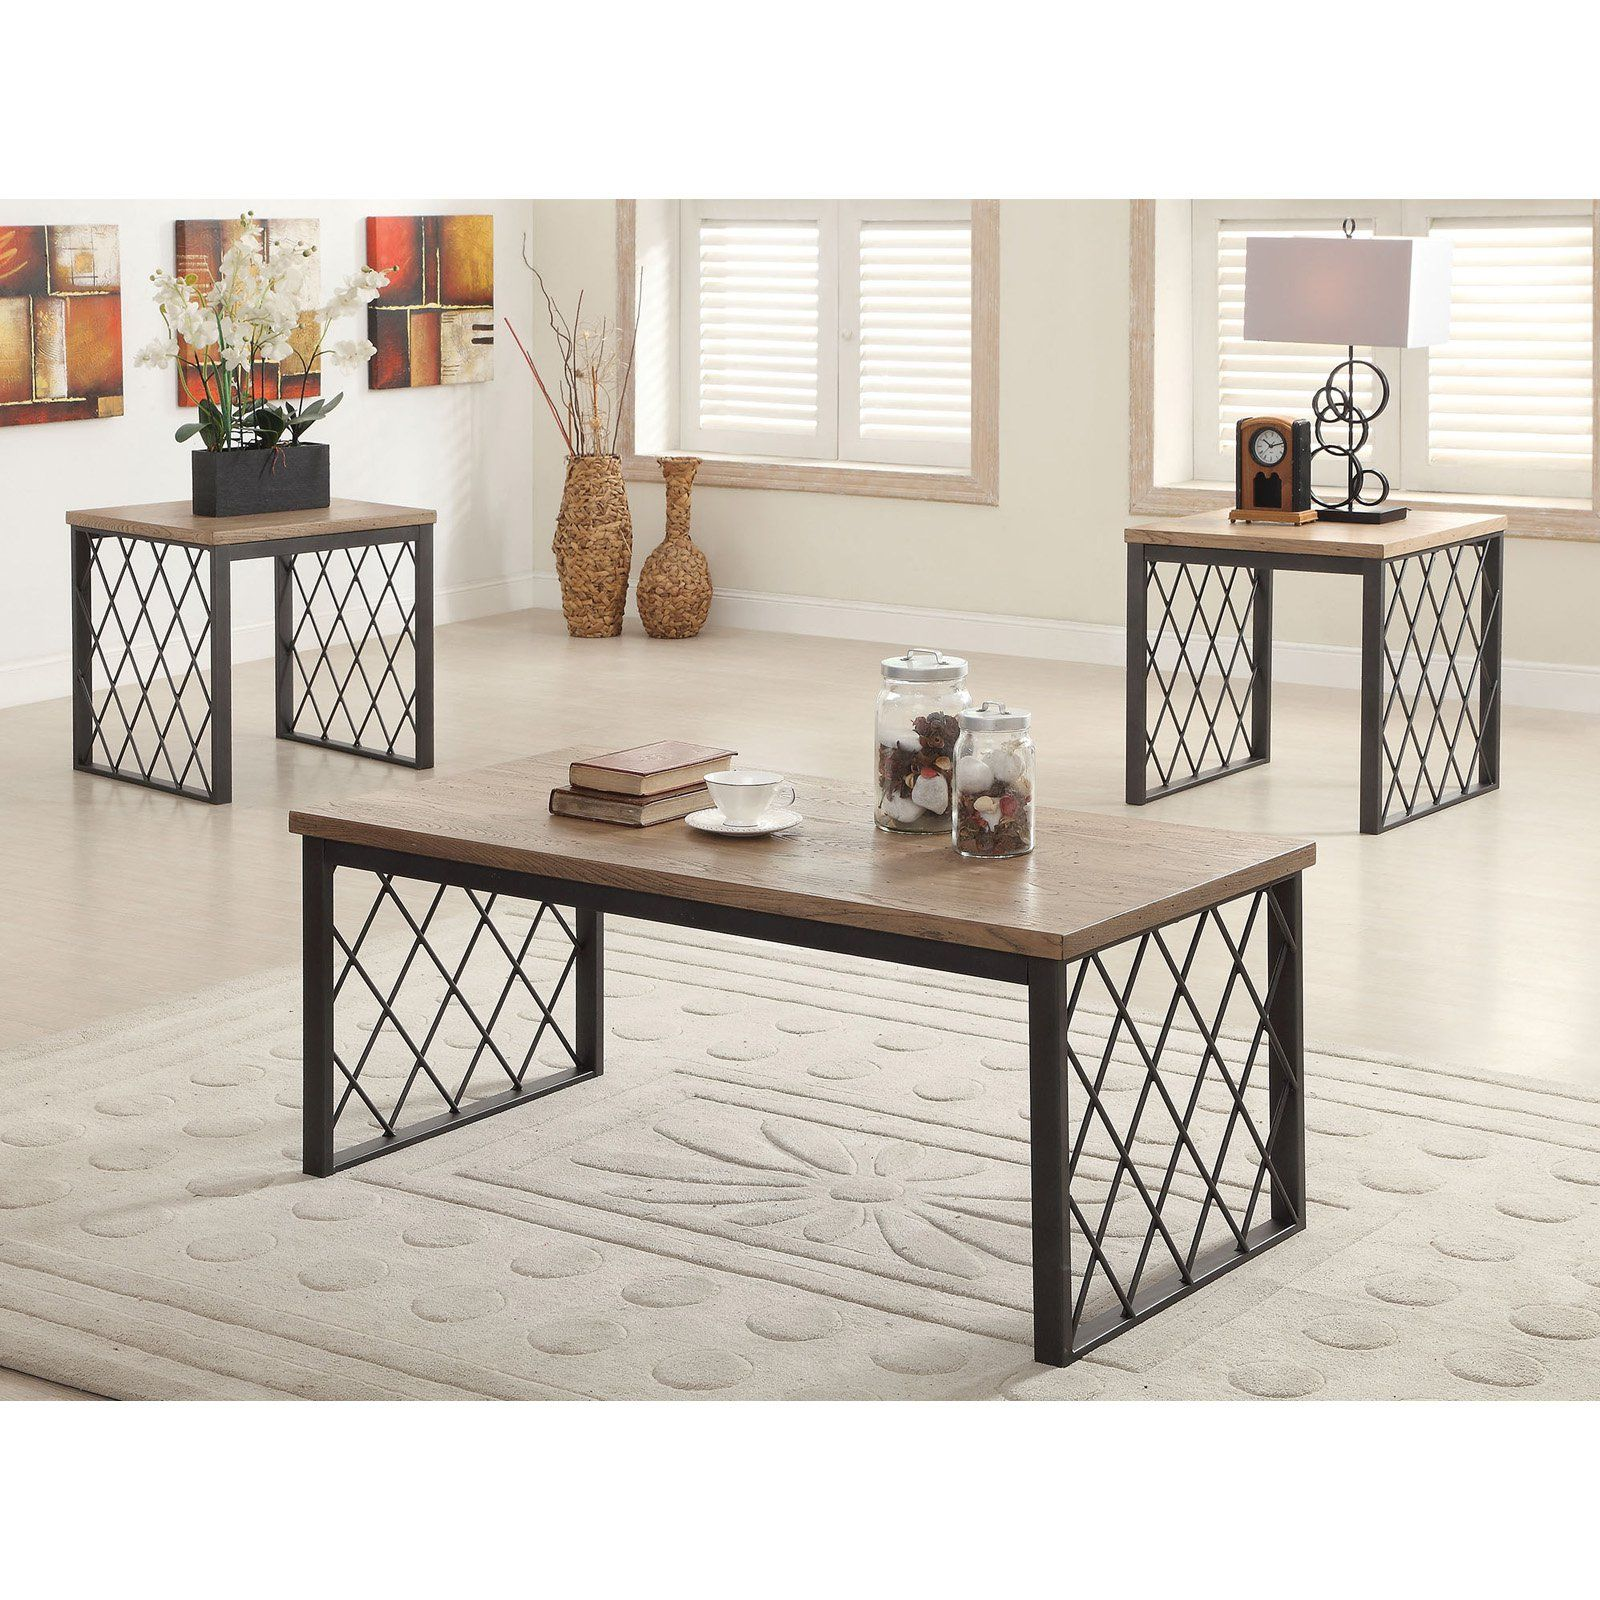 Best Acme Furniture Catalina Light Oak And Gray 3 Piece Coffee 400 x 300